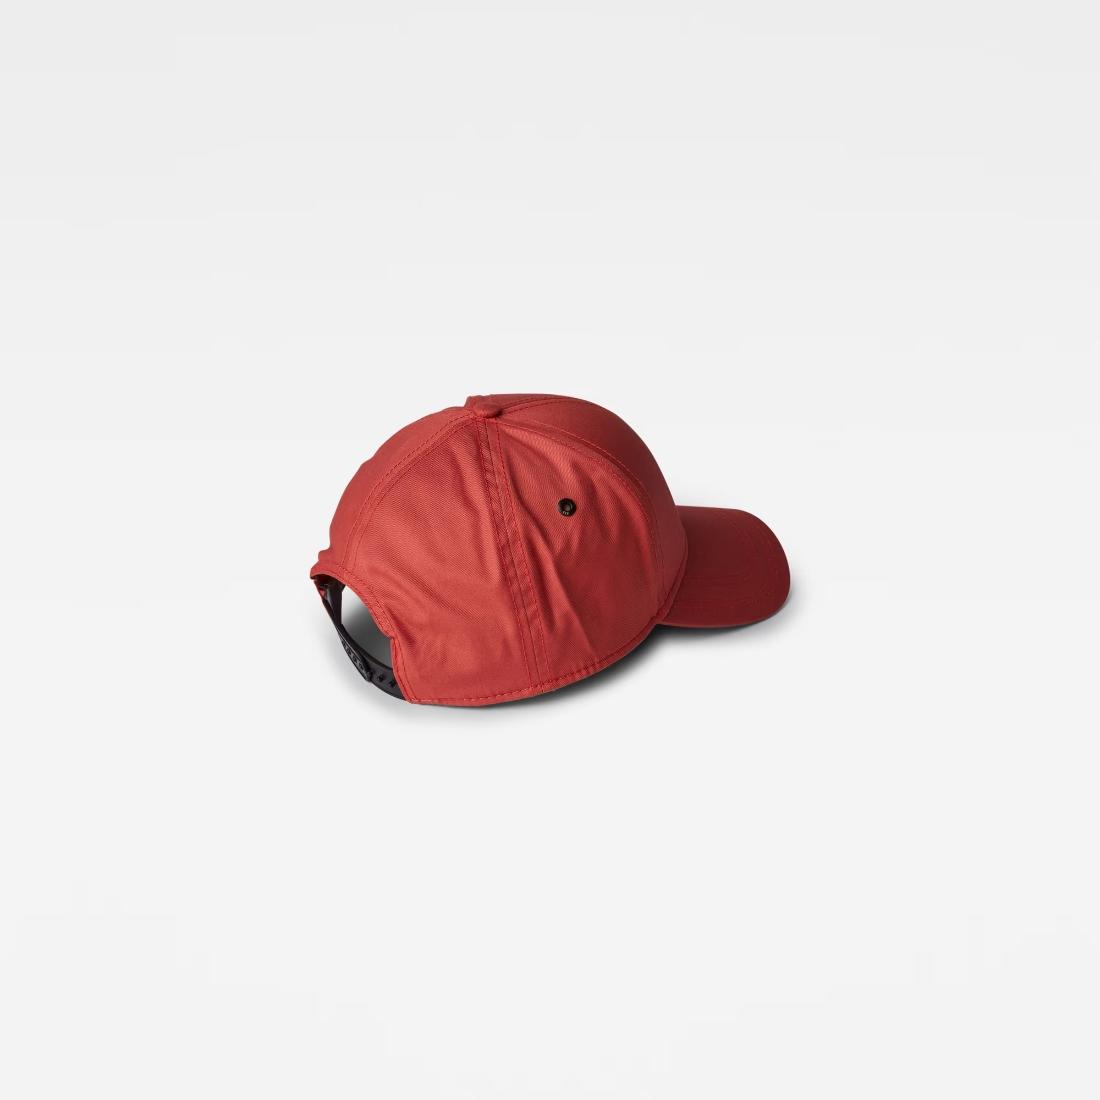 G STAR RAW ORIGINALS BASEBALL CAP 3